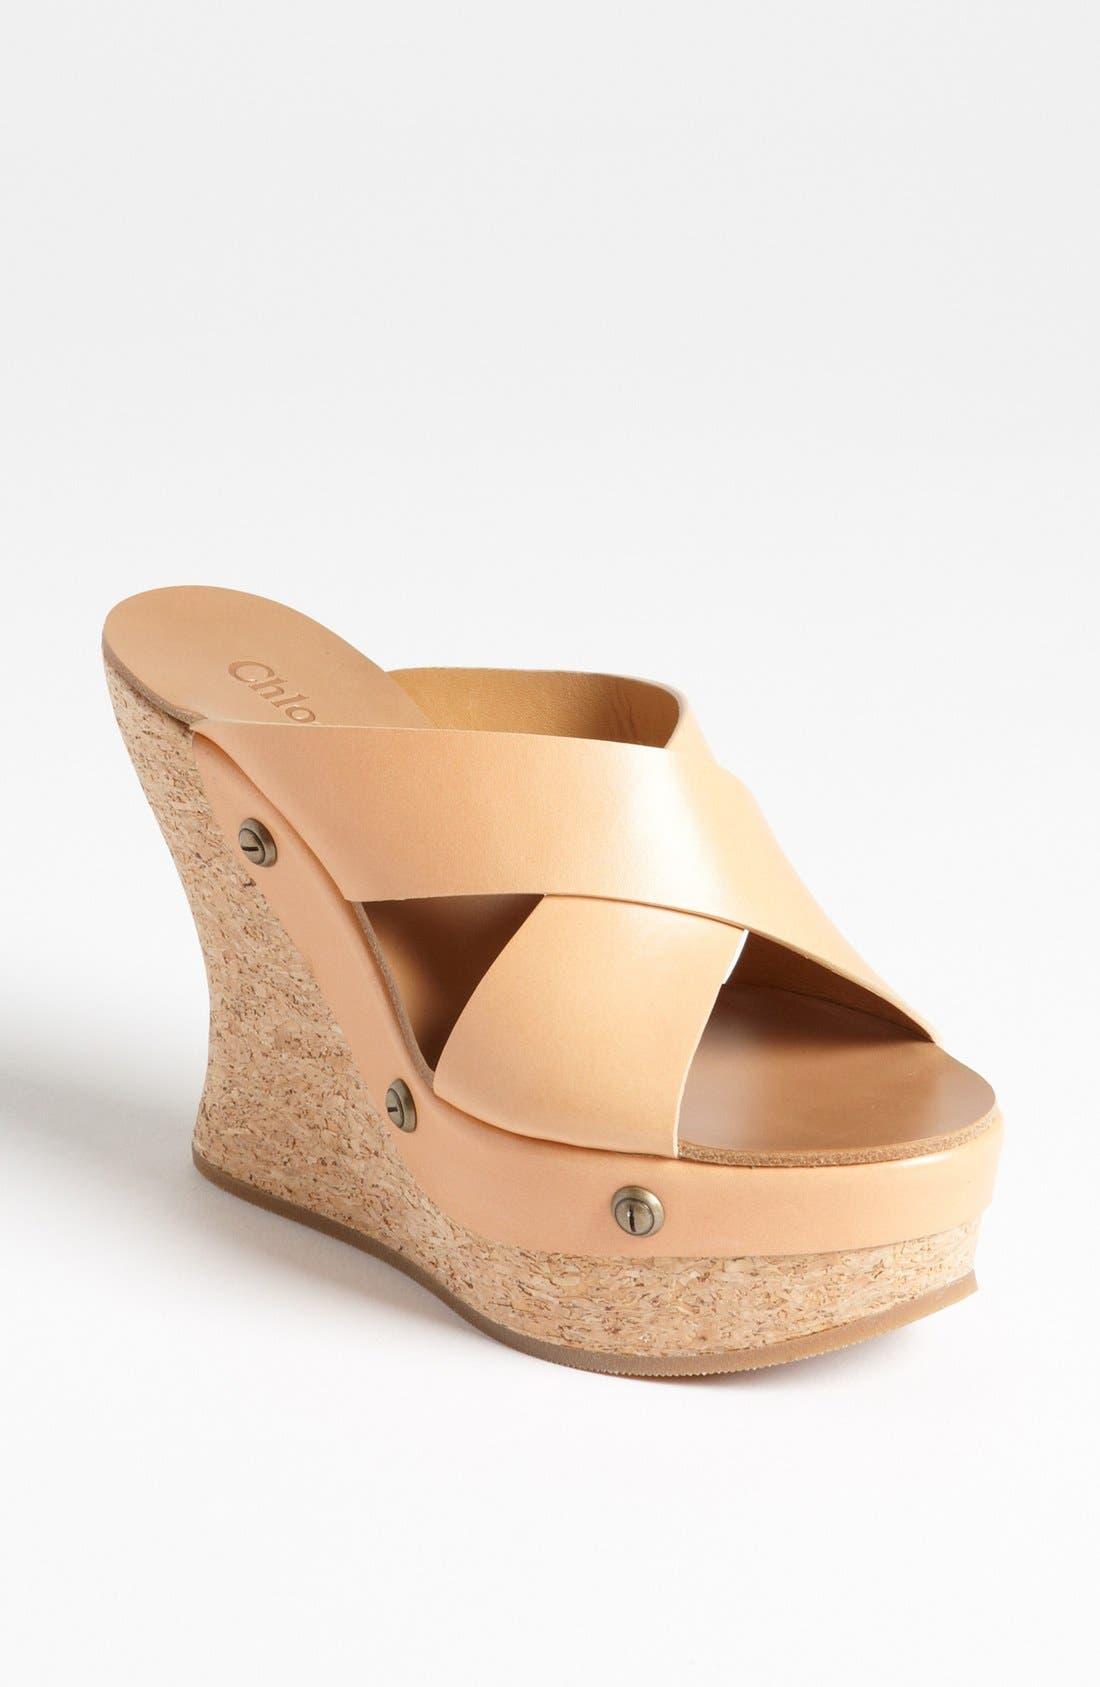 Cork Platform Wedge Sandal,                             Main thumbnail 1, color,                             250